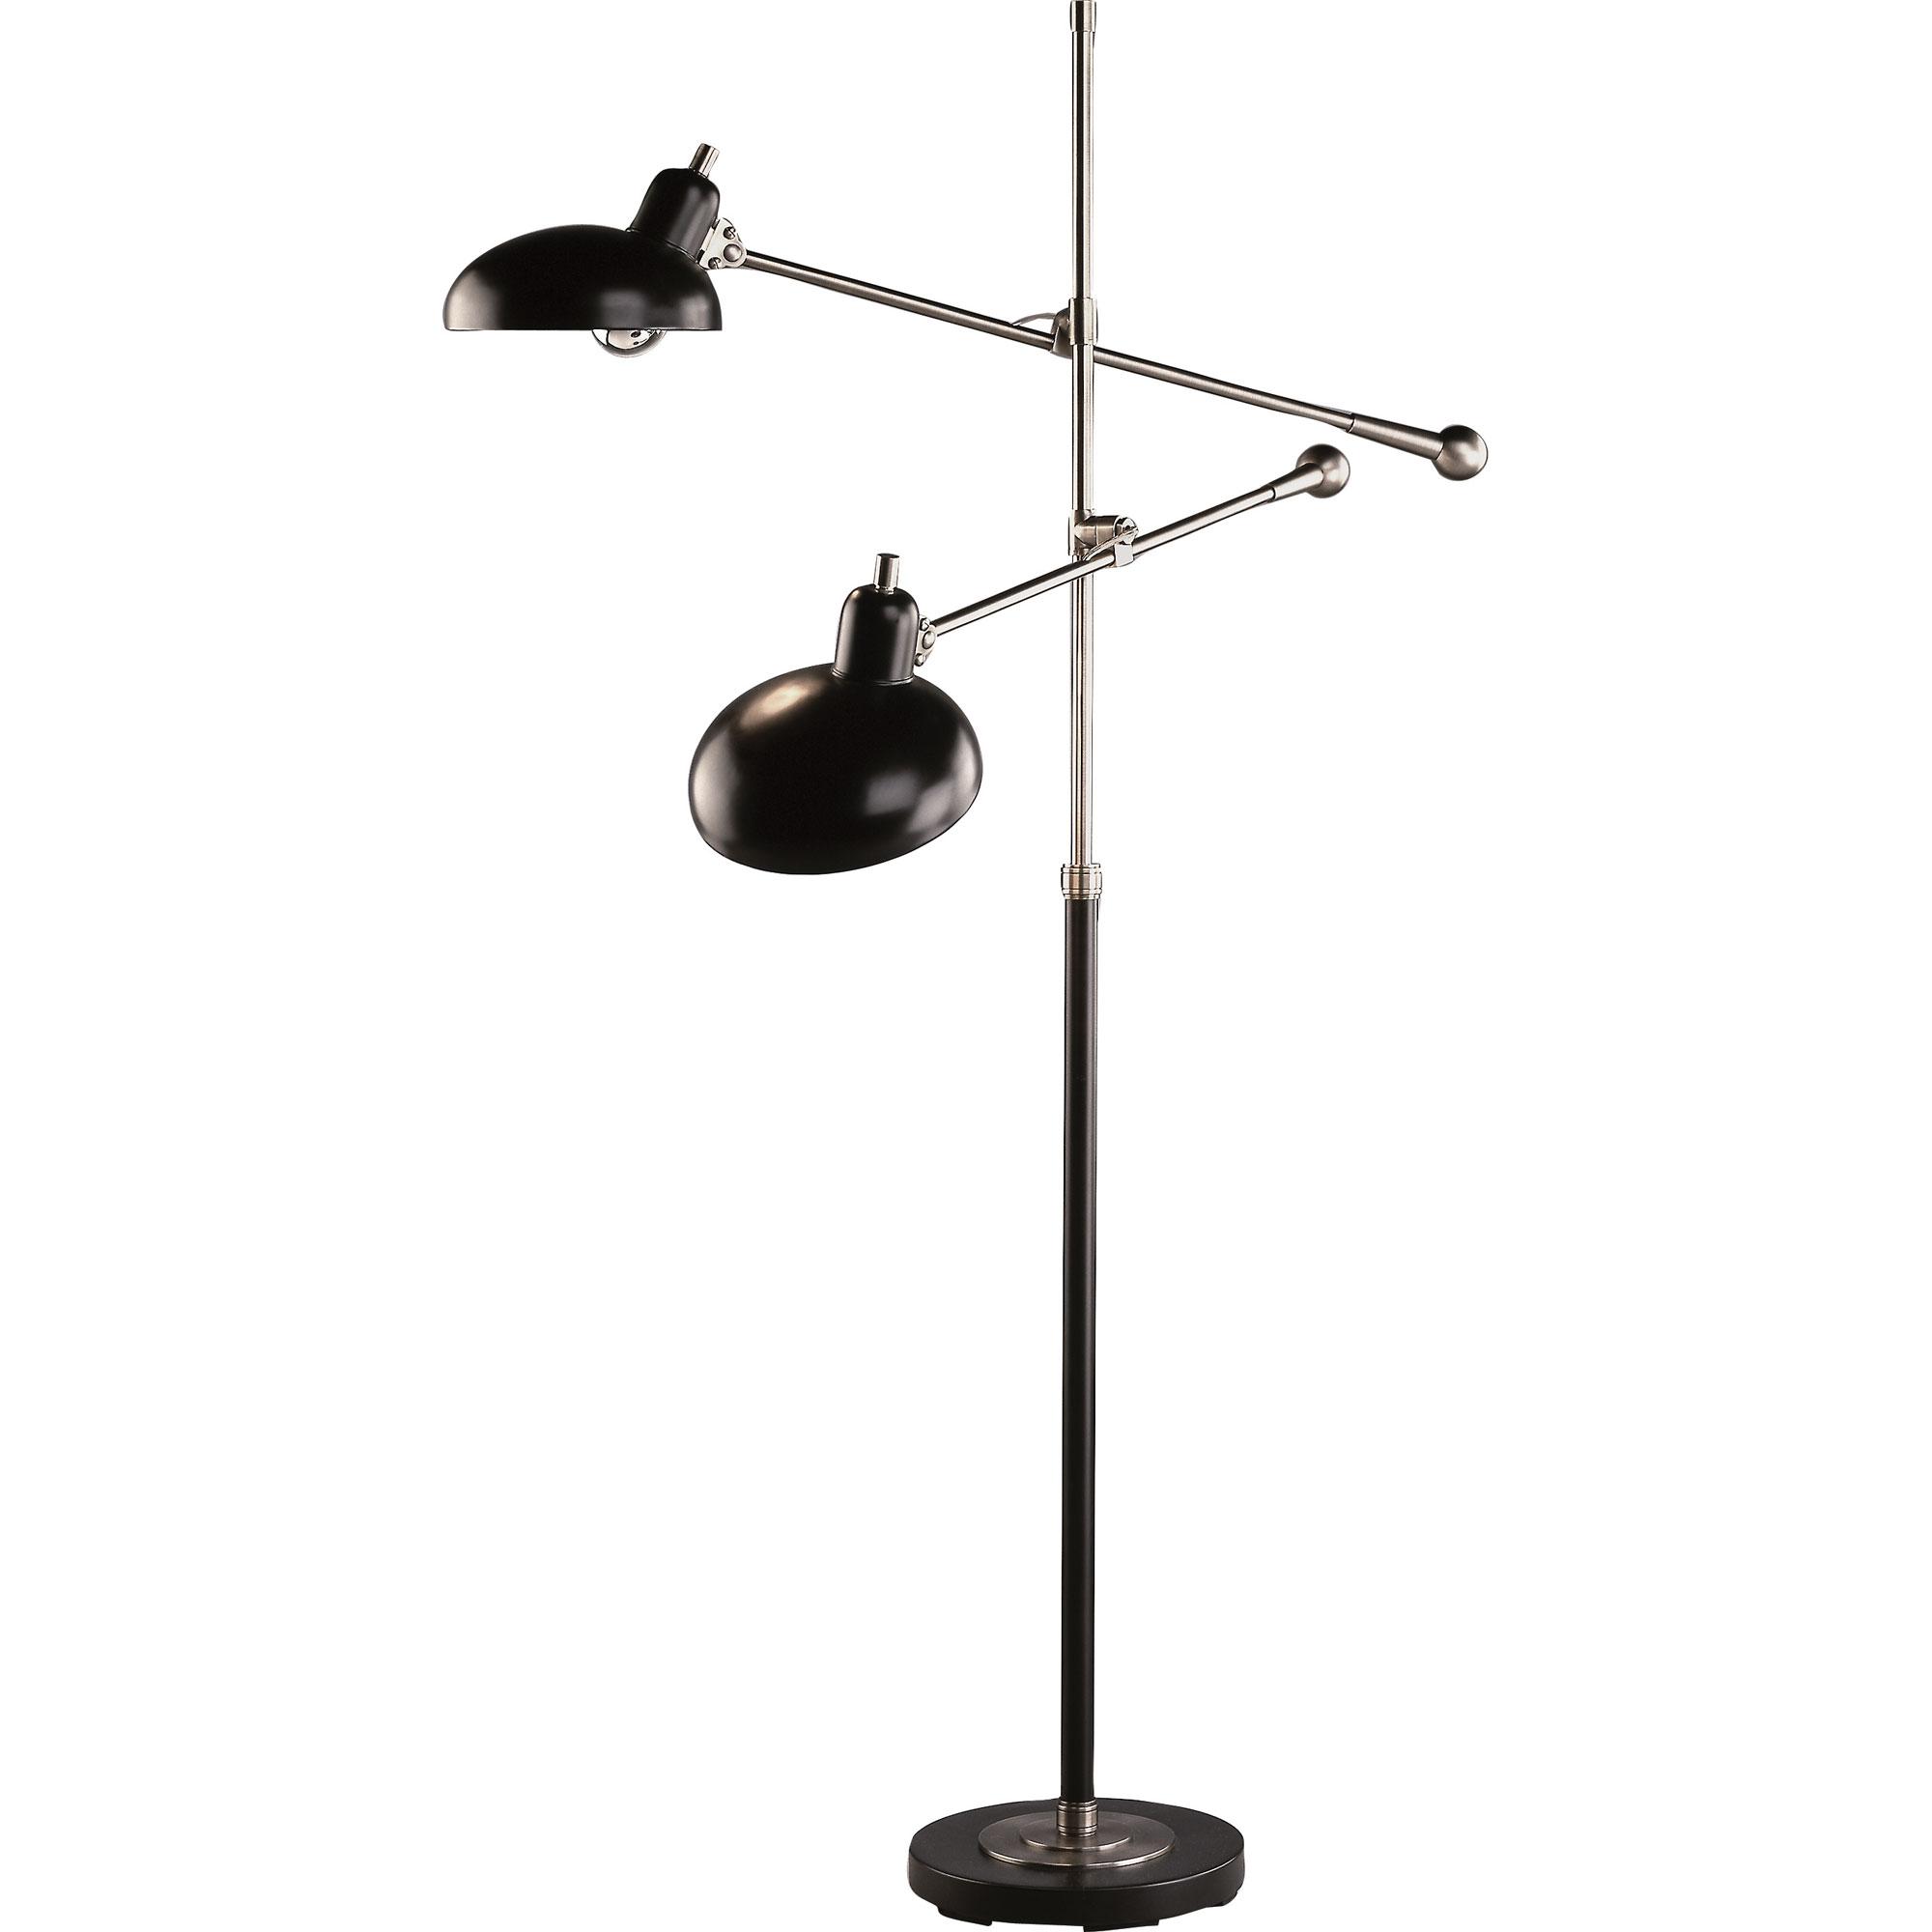 Superbe Bruno Adjustable Double Arm Pharmacy Floor Lamp By Robert Abbey